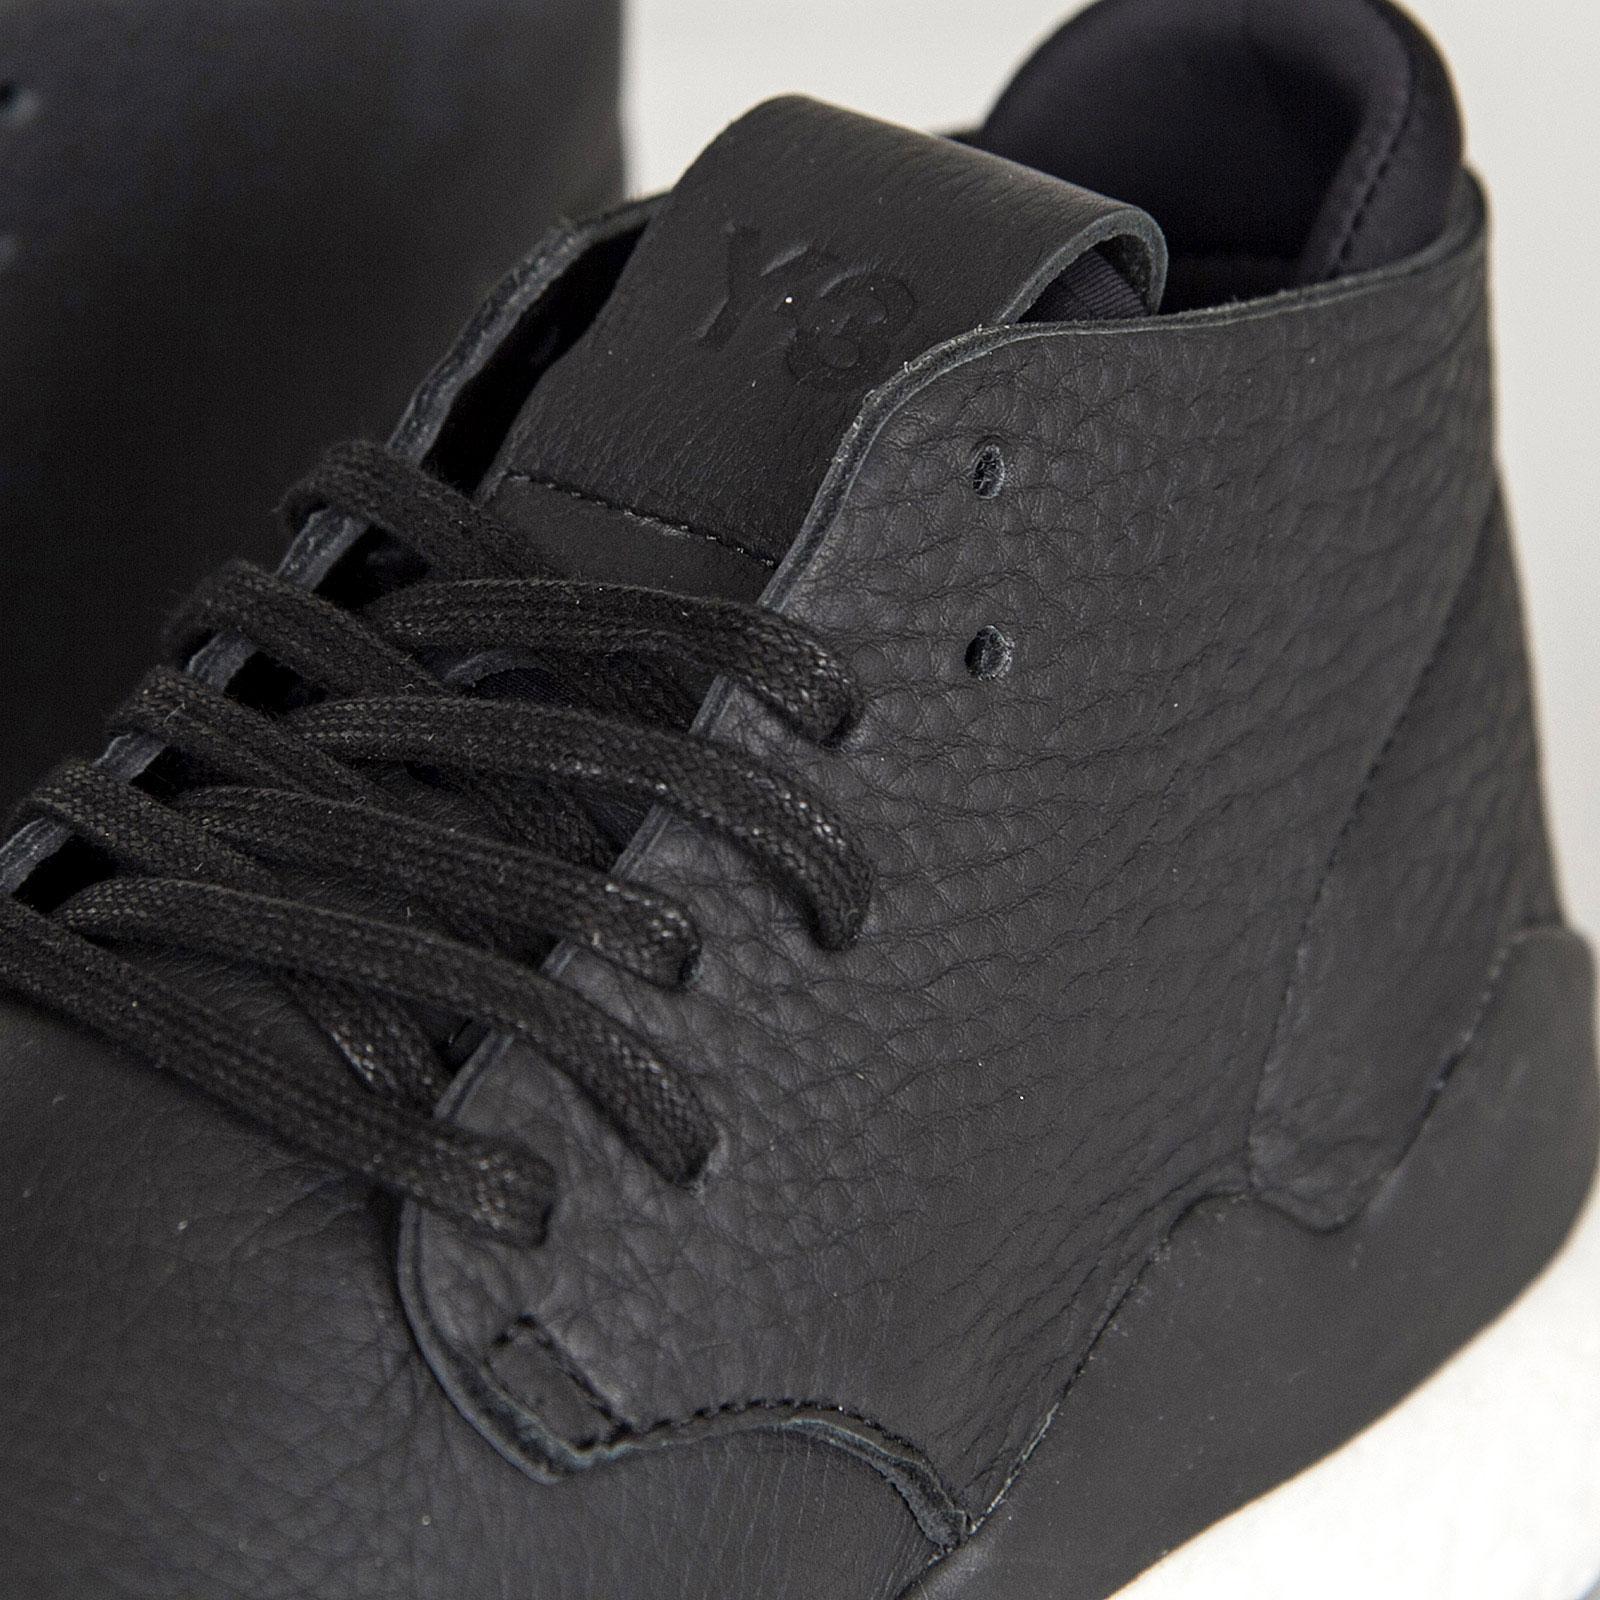 5a56c5f90 adidas Y-3 Desert Boost - S83260 - Sneakersnstuff